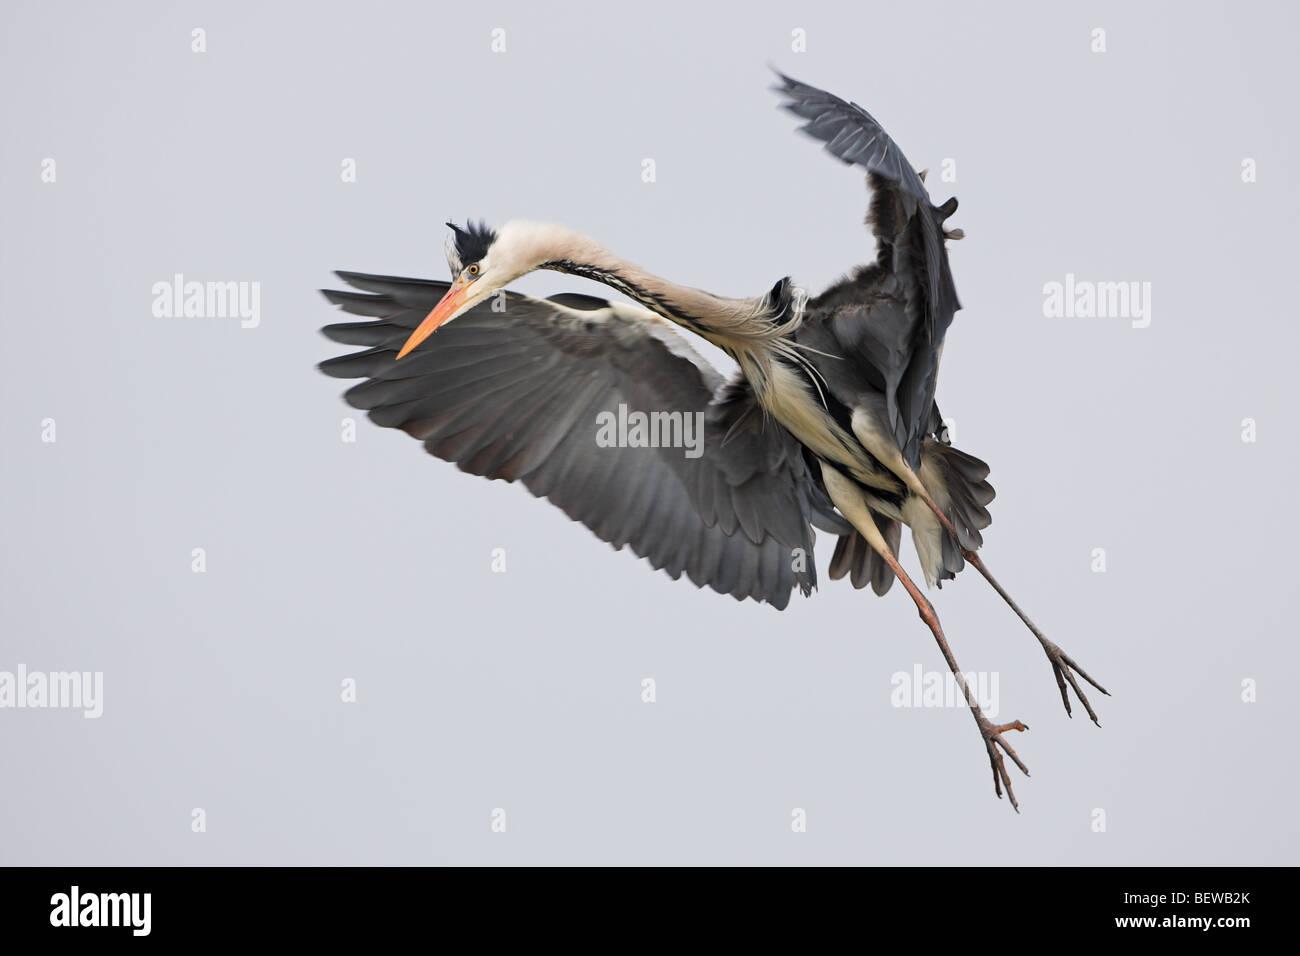 Grey Heron (Ardea cinerea) in landing approach, full-length shot - Stock Image